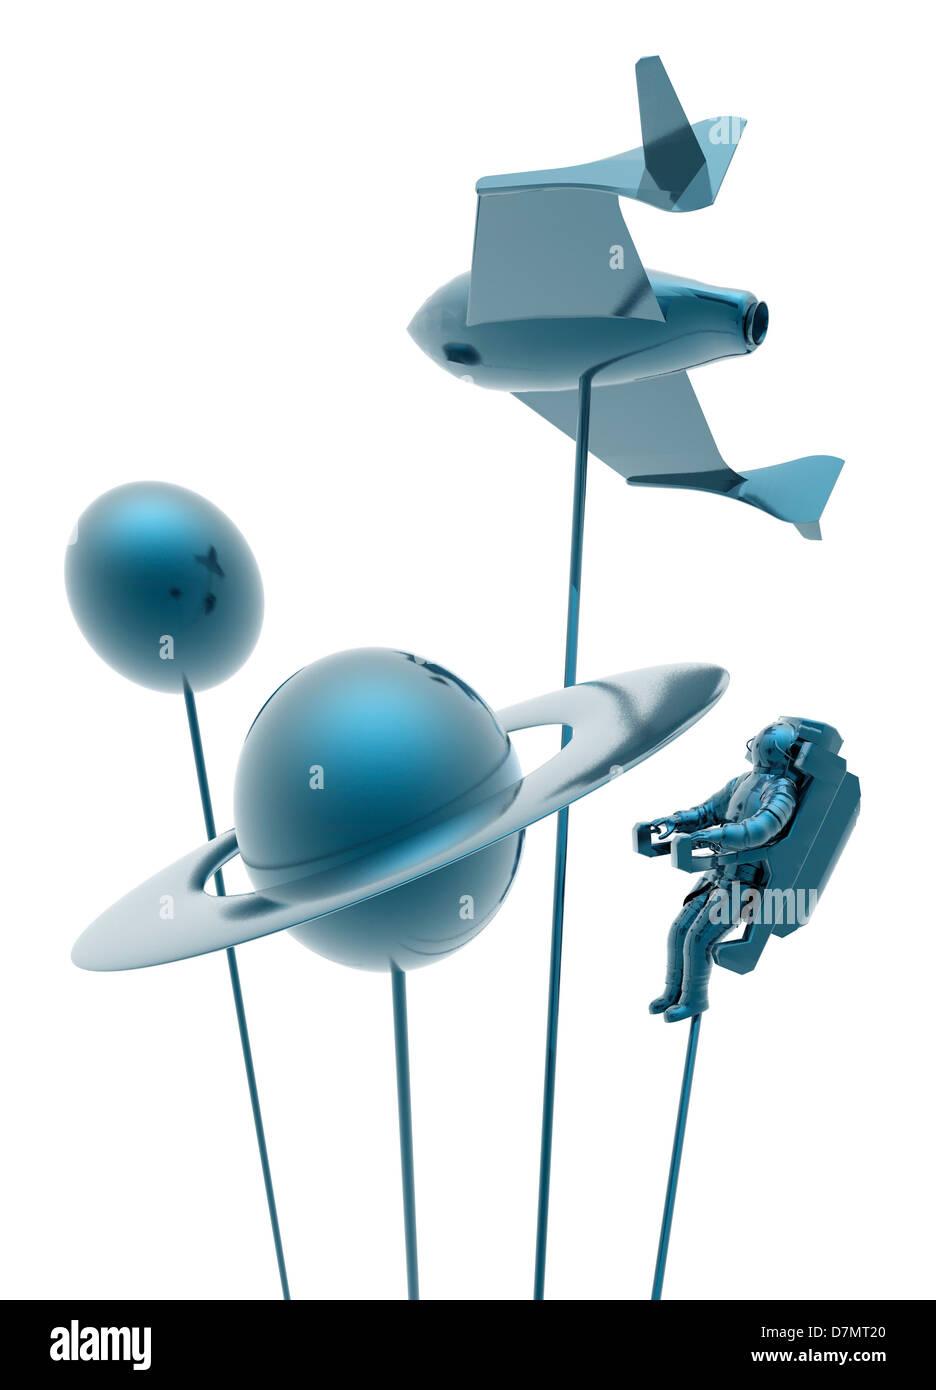 Space tourism, conceptual artwork - Stock Image